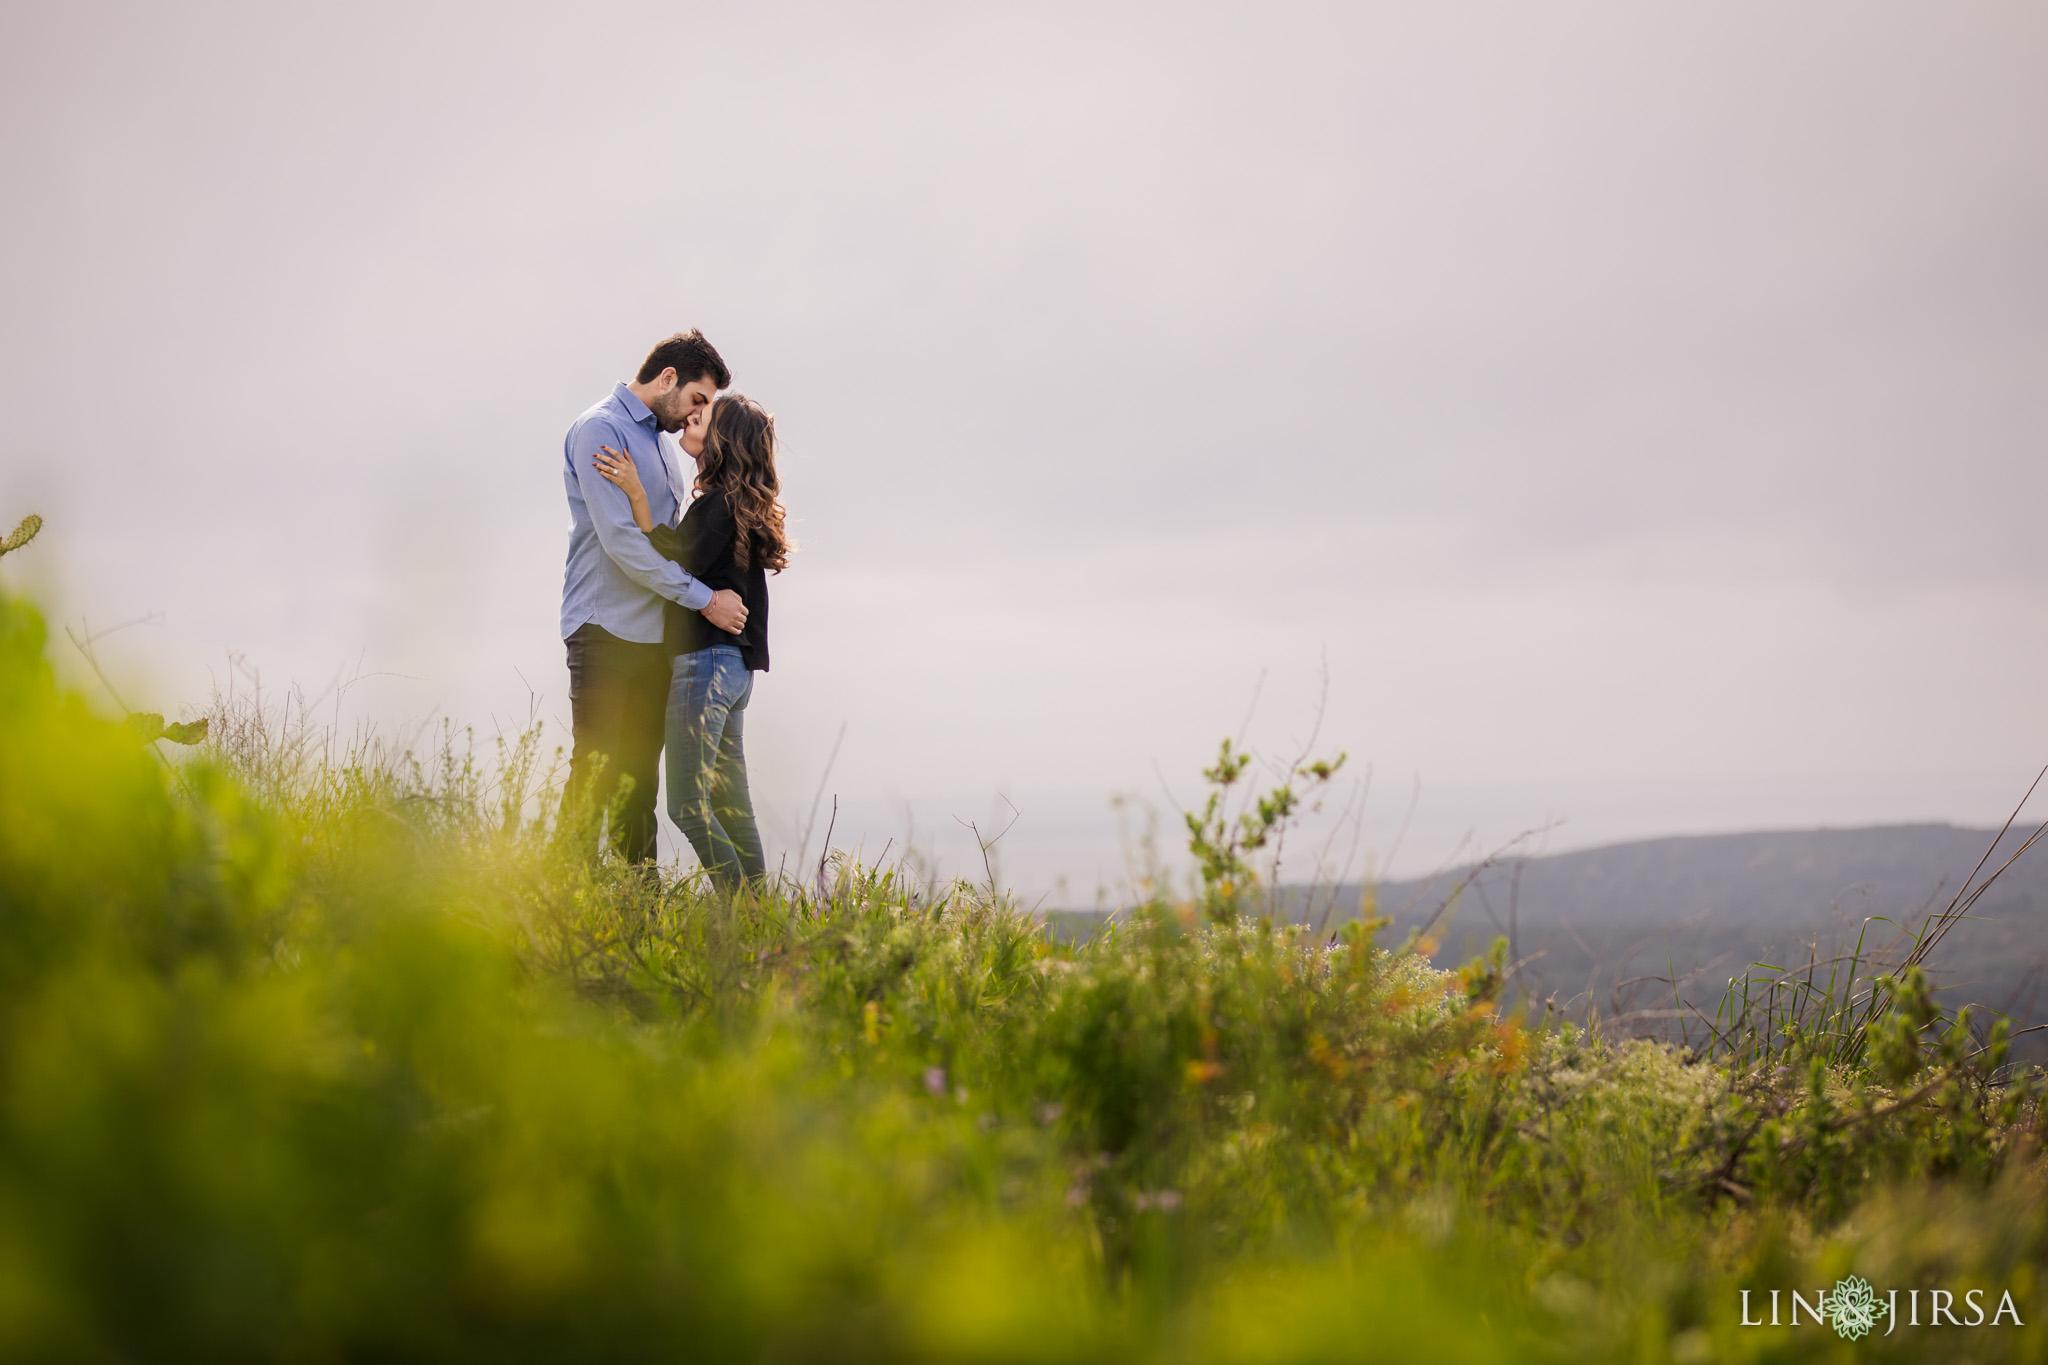 02 Top of the World Laguna Beach Engagement Photography